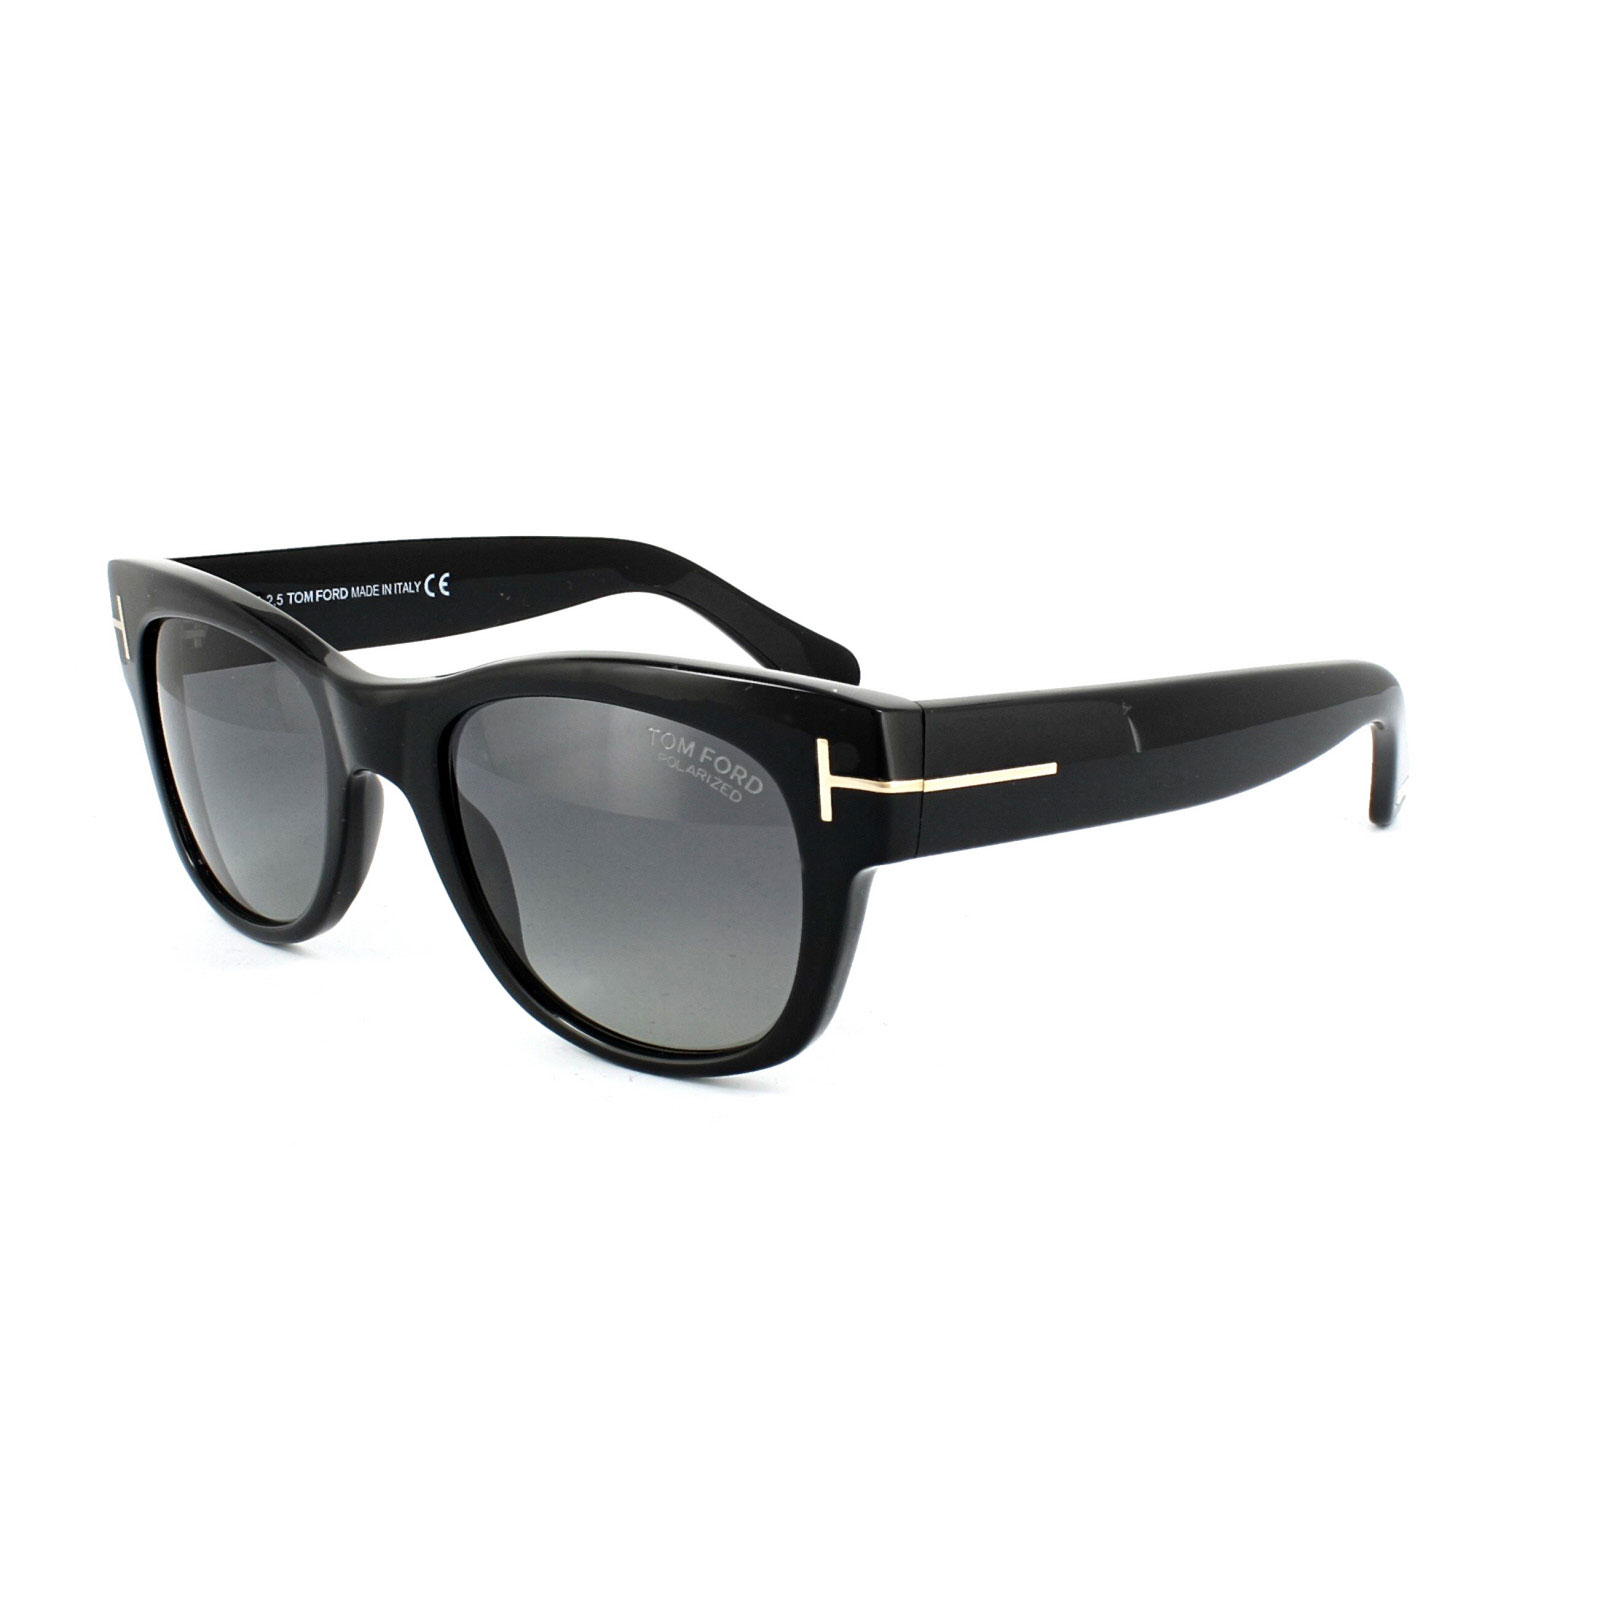 e84a5c73e0c9 Sentinel Tom Ford Sunglasses 0058 CARY 01D Shiny Black Smoke Grey Polarized